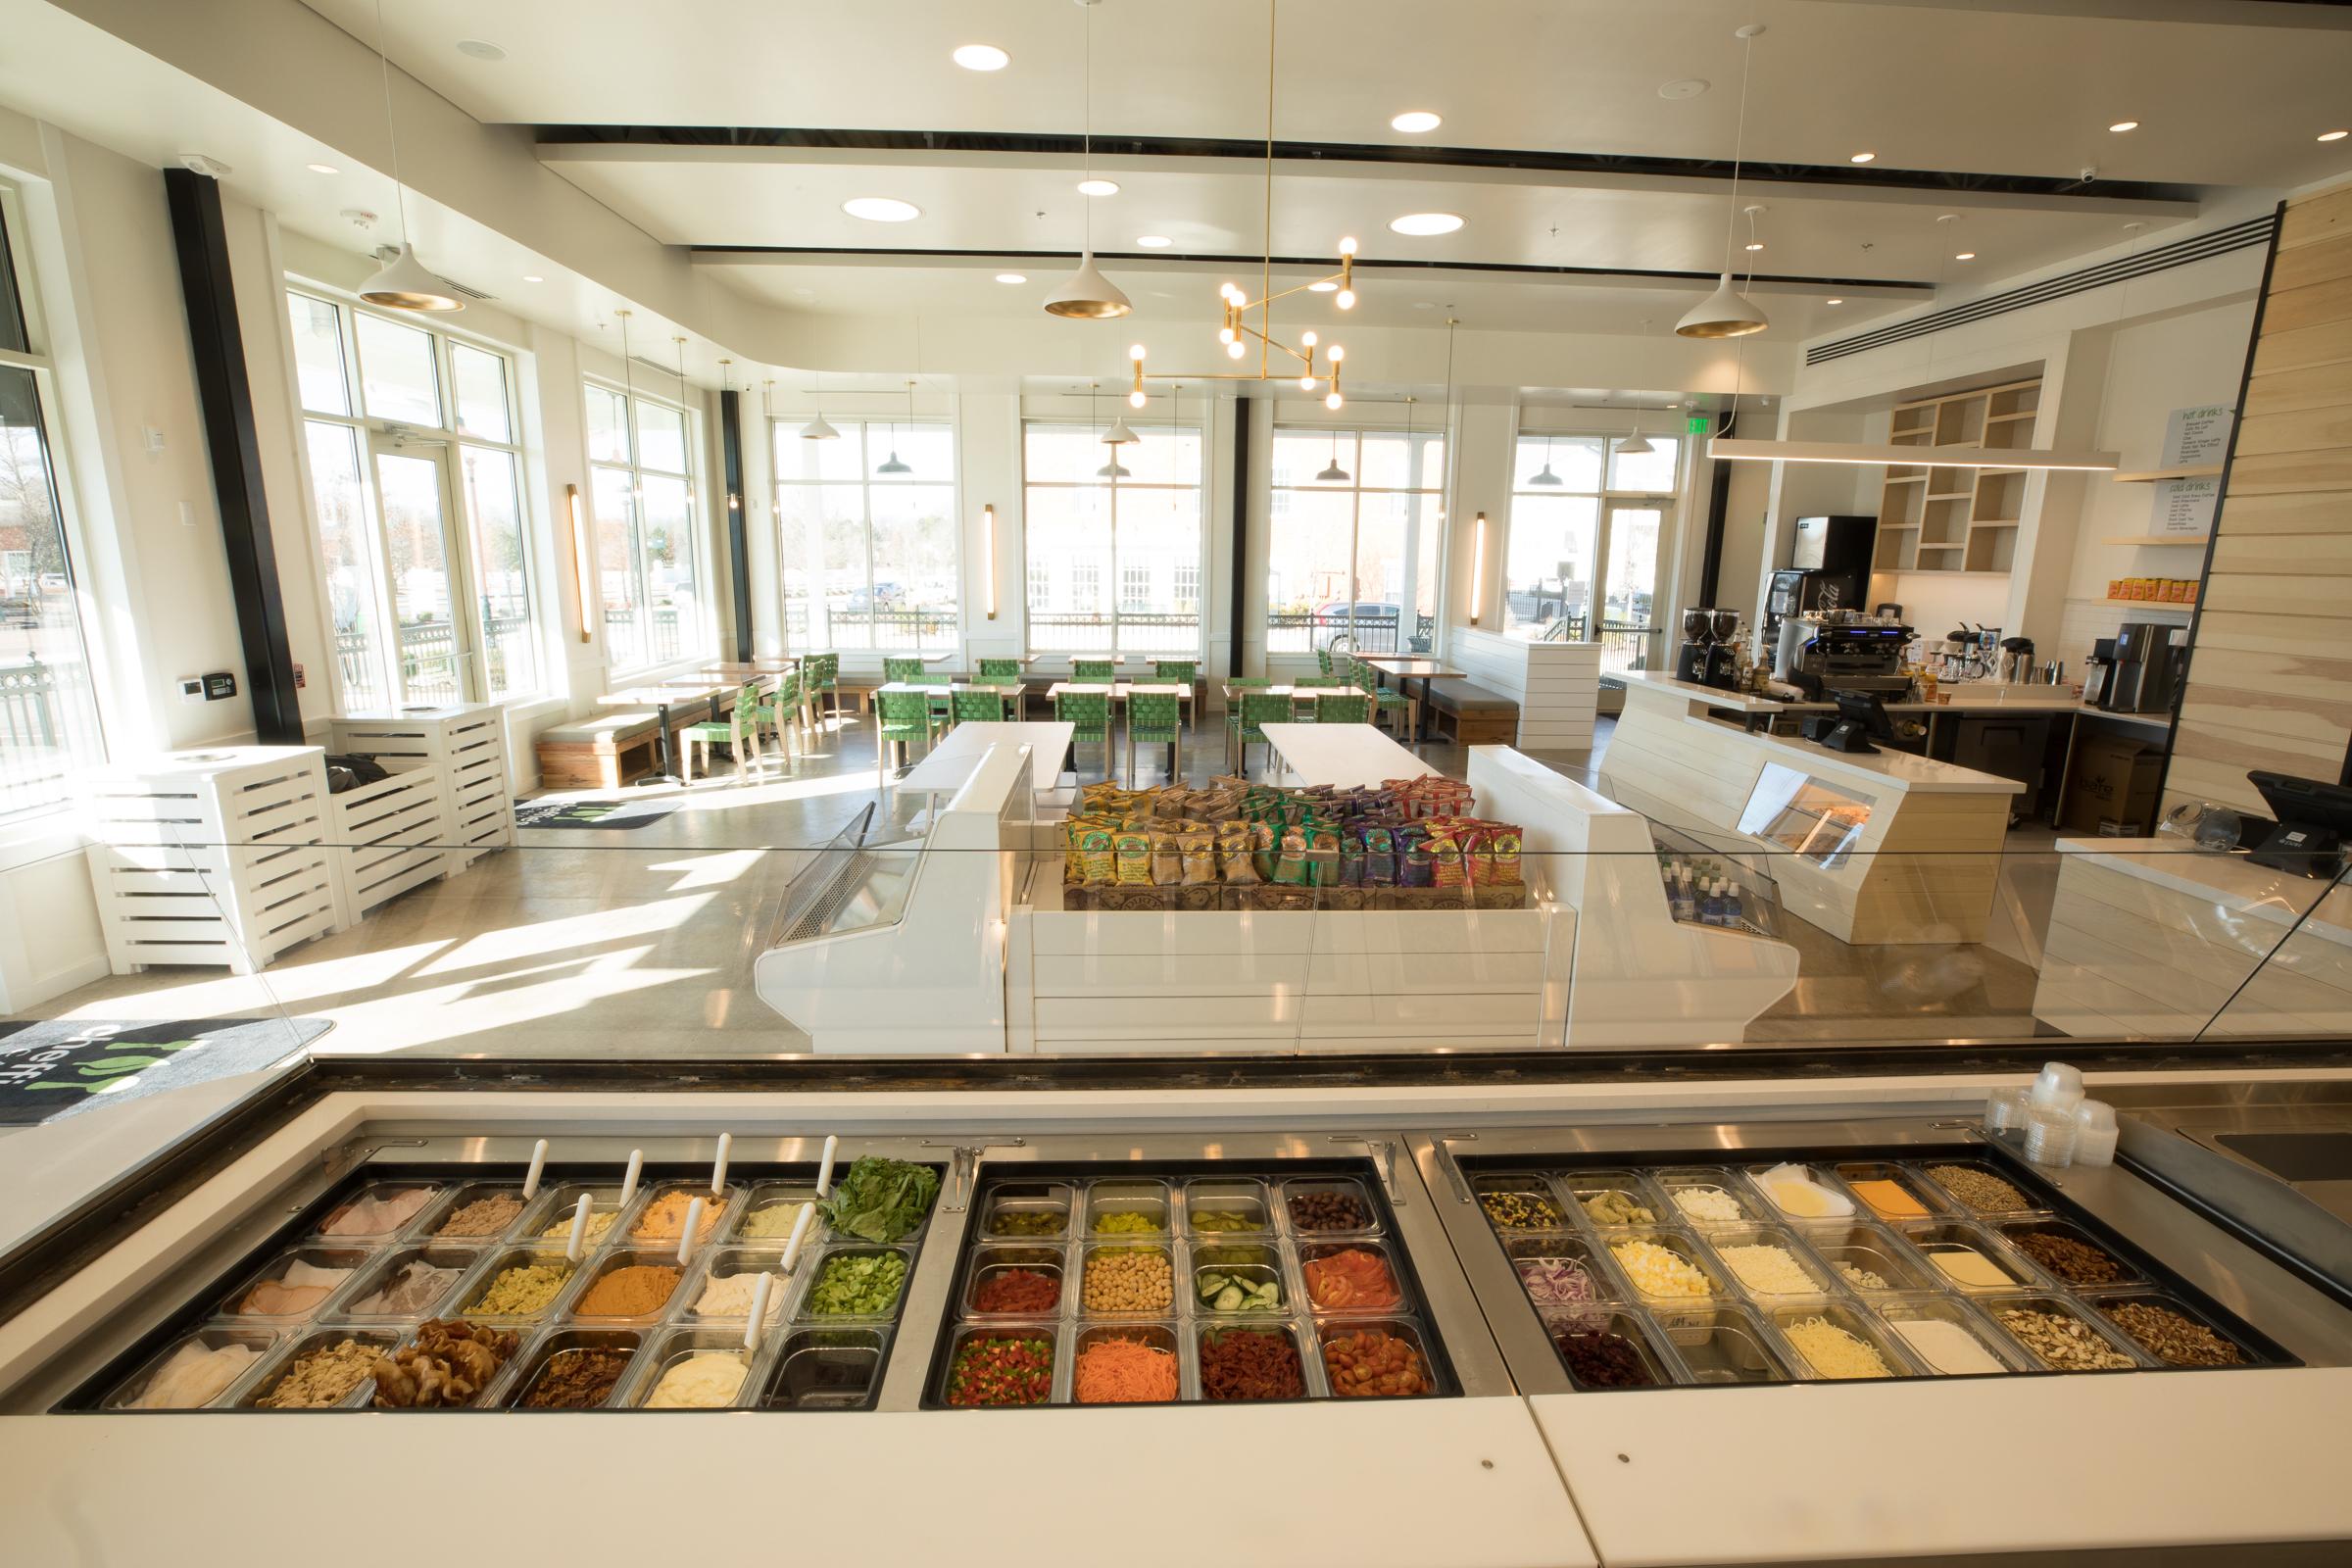 Cheffie's salad bar of ingredients